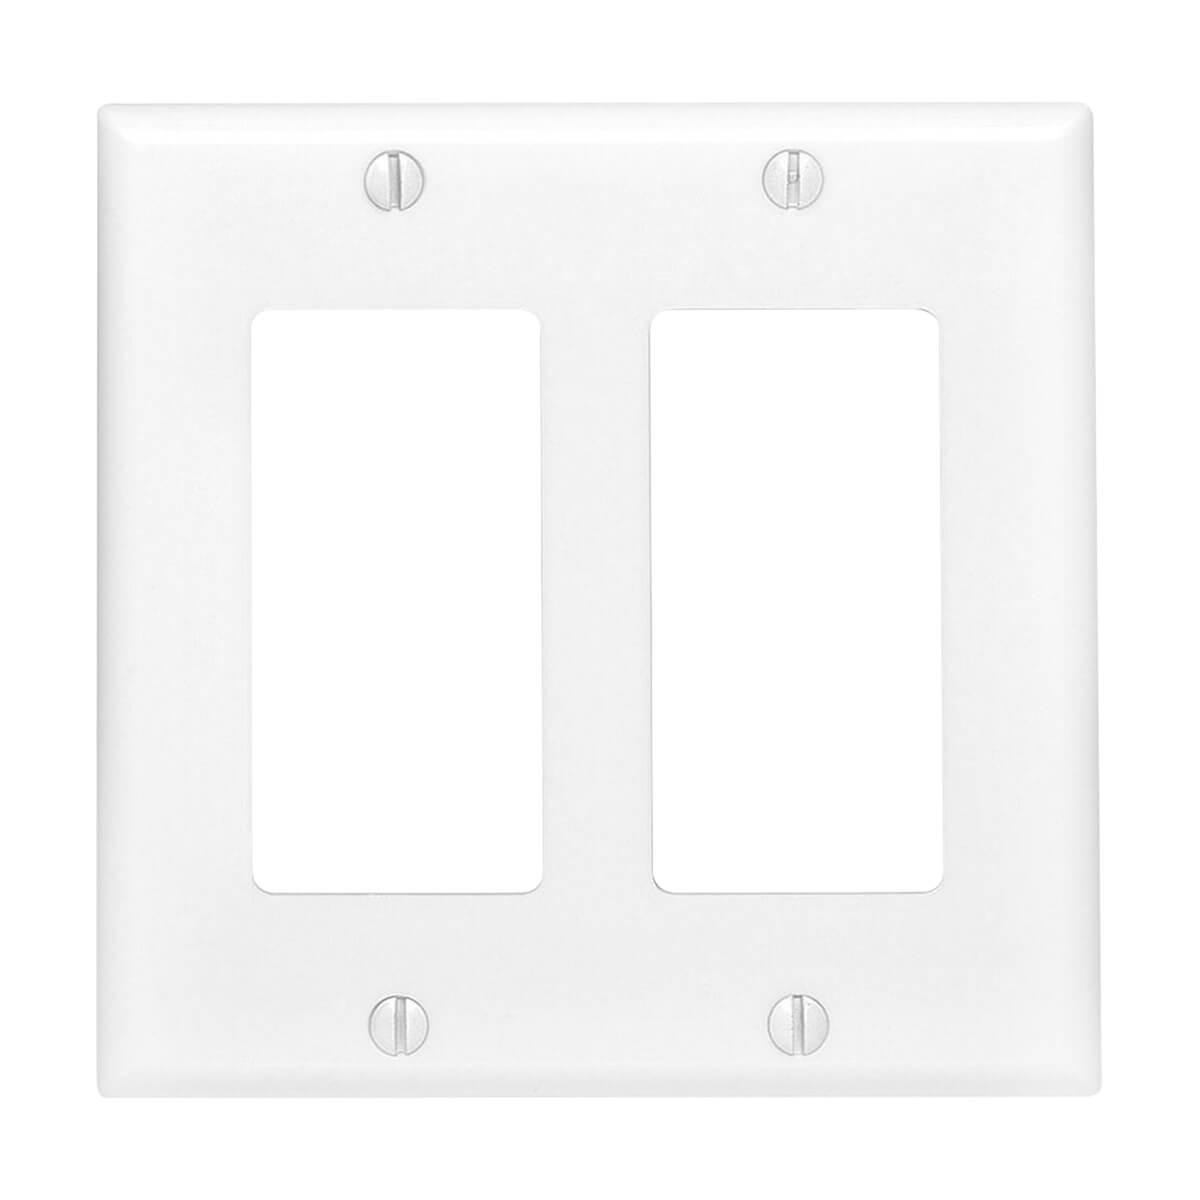 Union 80409w Residential-Grade Decor Wall Plates - Dual Gang - White